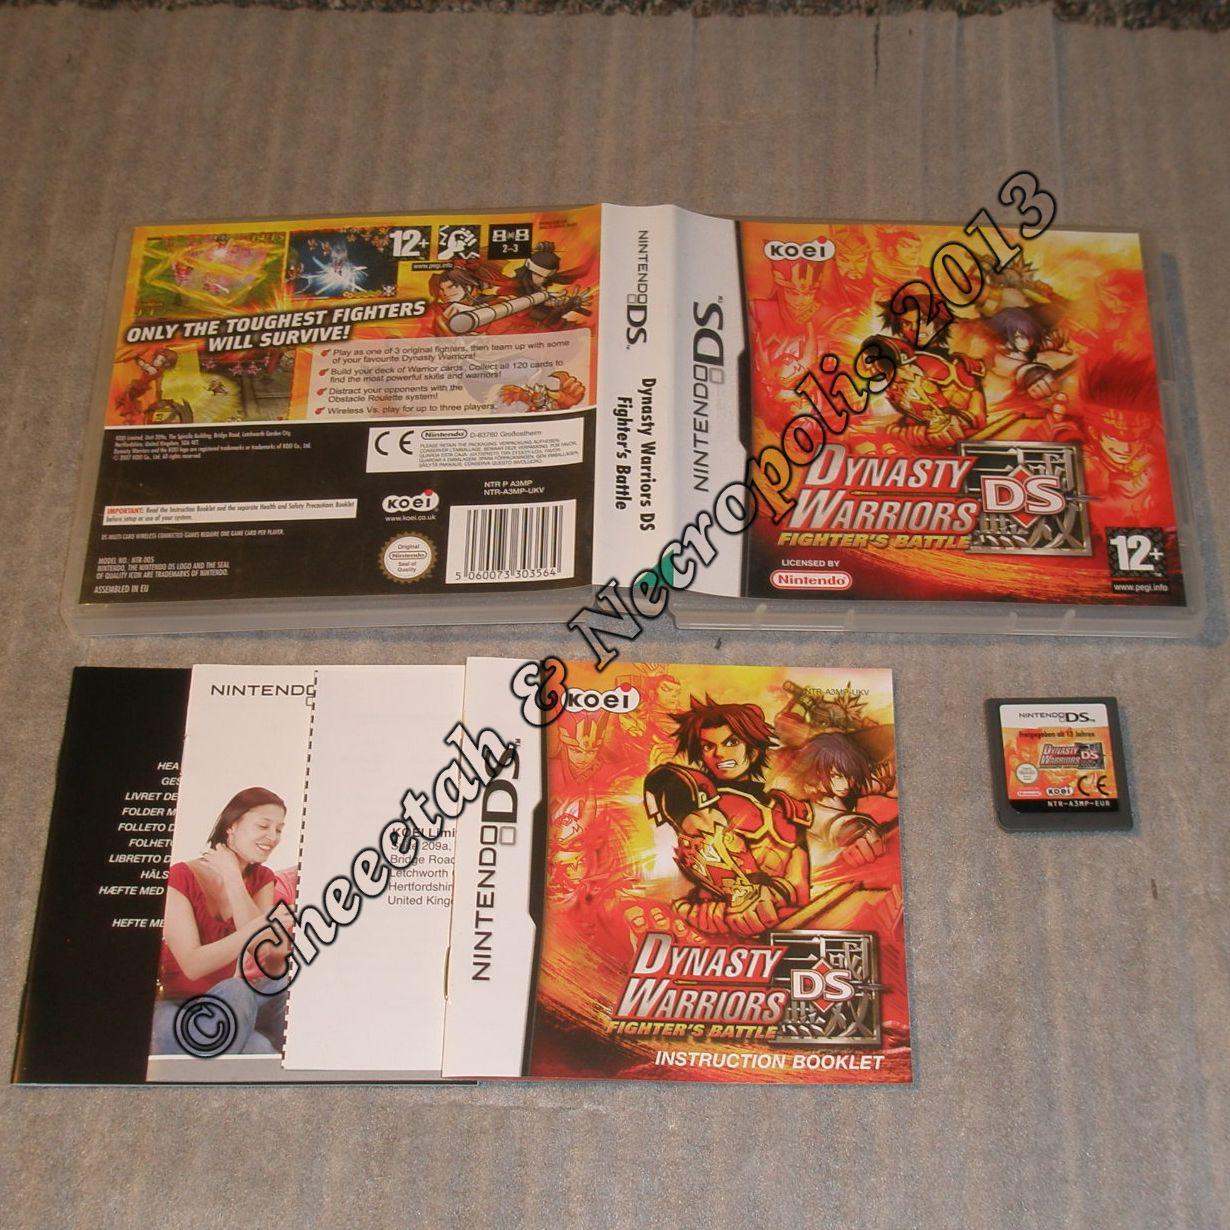 http://arcadius.esero.net/Console/Nintendo/DS/Games/complete/Dynasty_Warriors_DS.jpg